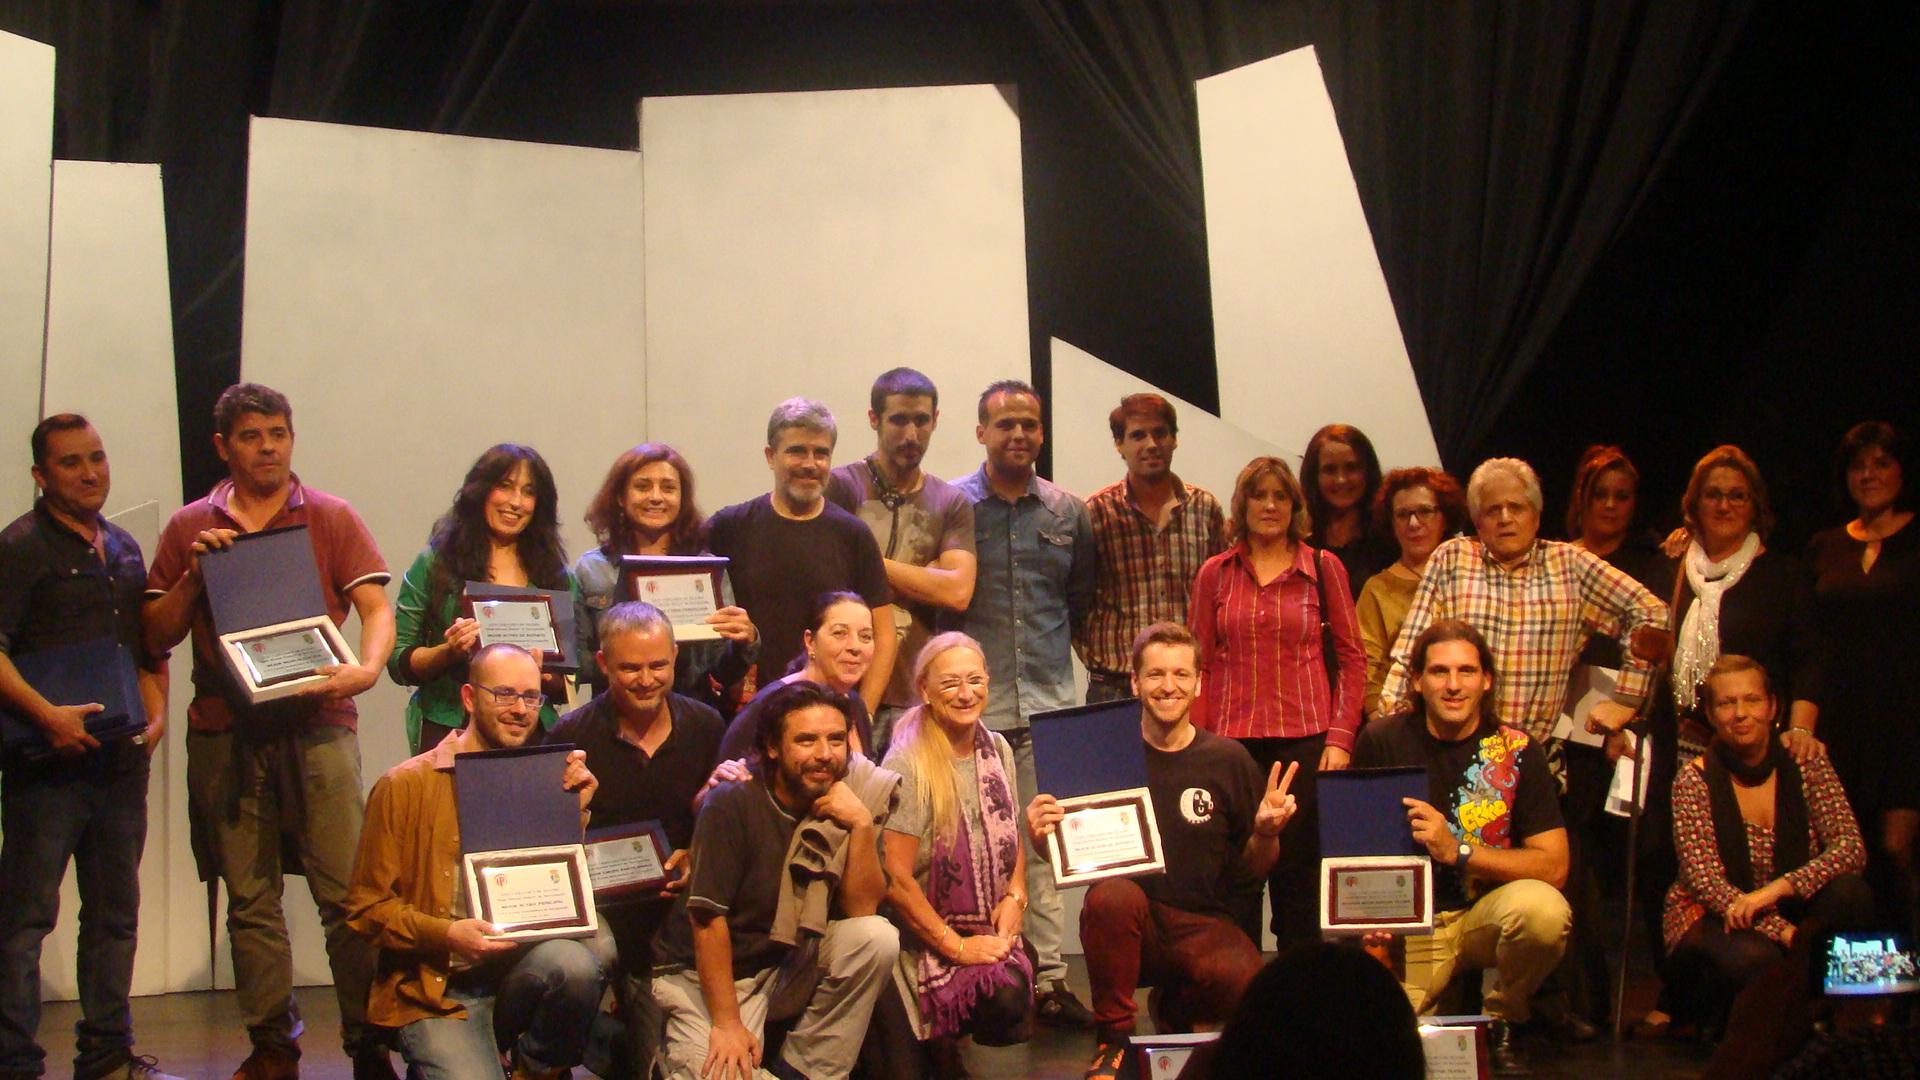 Carabau Teatro obtiene el premio al Primer Montaje teatral en el XXIV Certamen Nacional de Teatro Amateur «Raúl Moreno Molero»